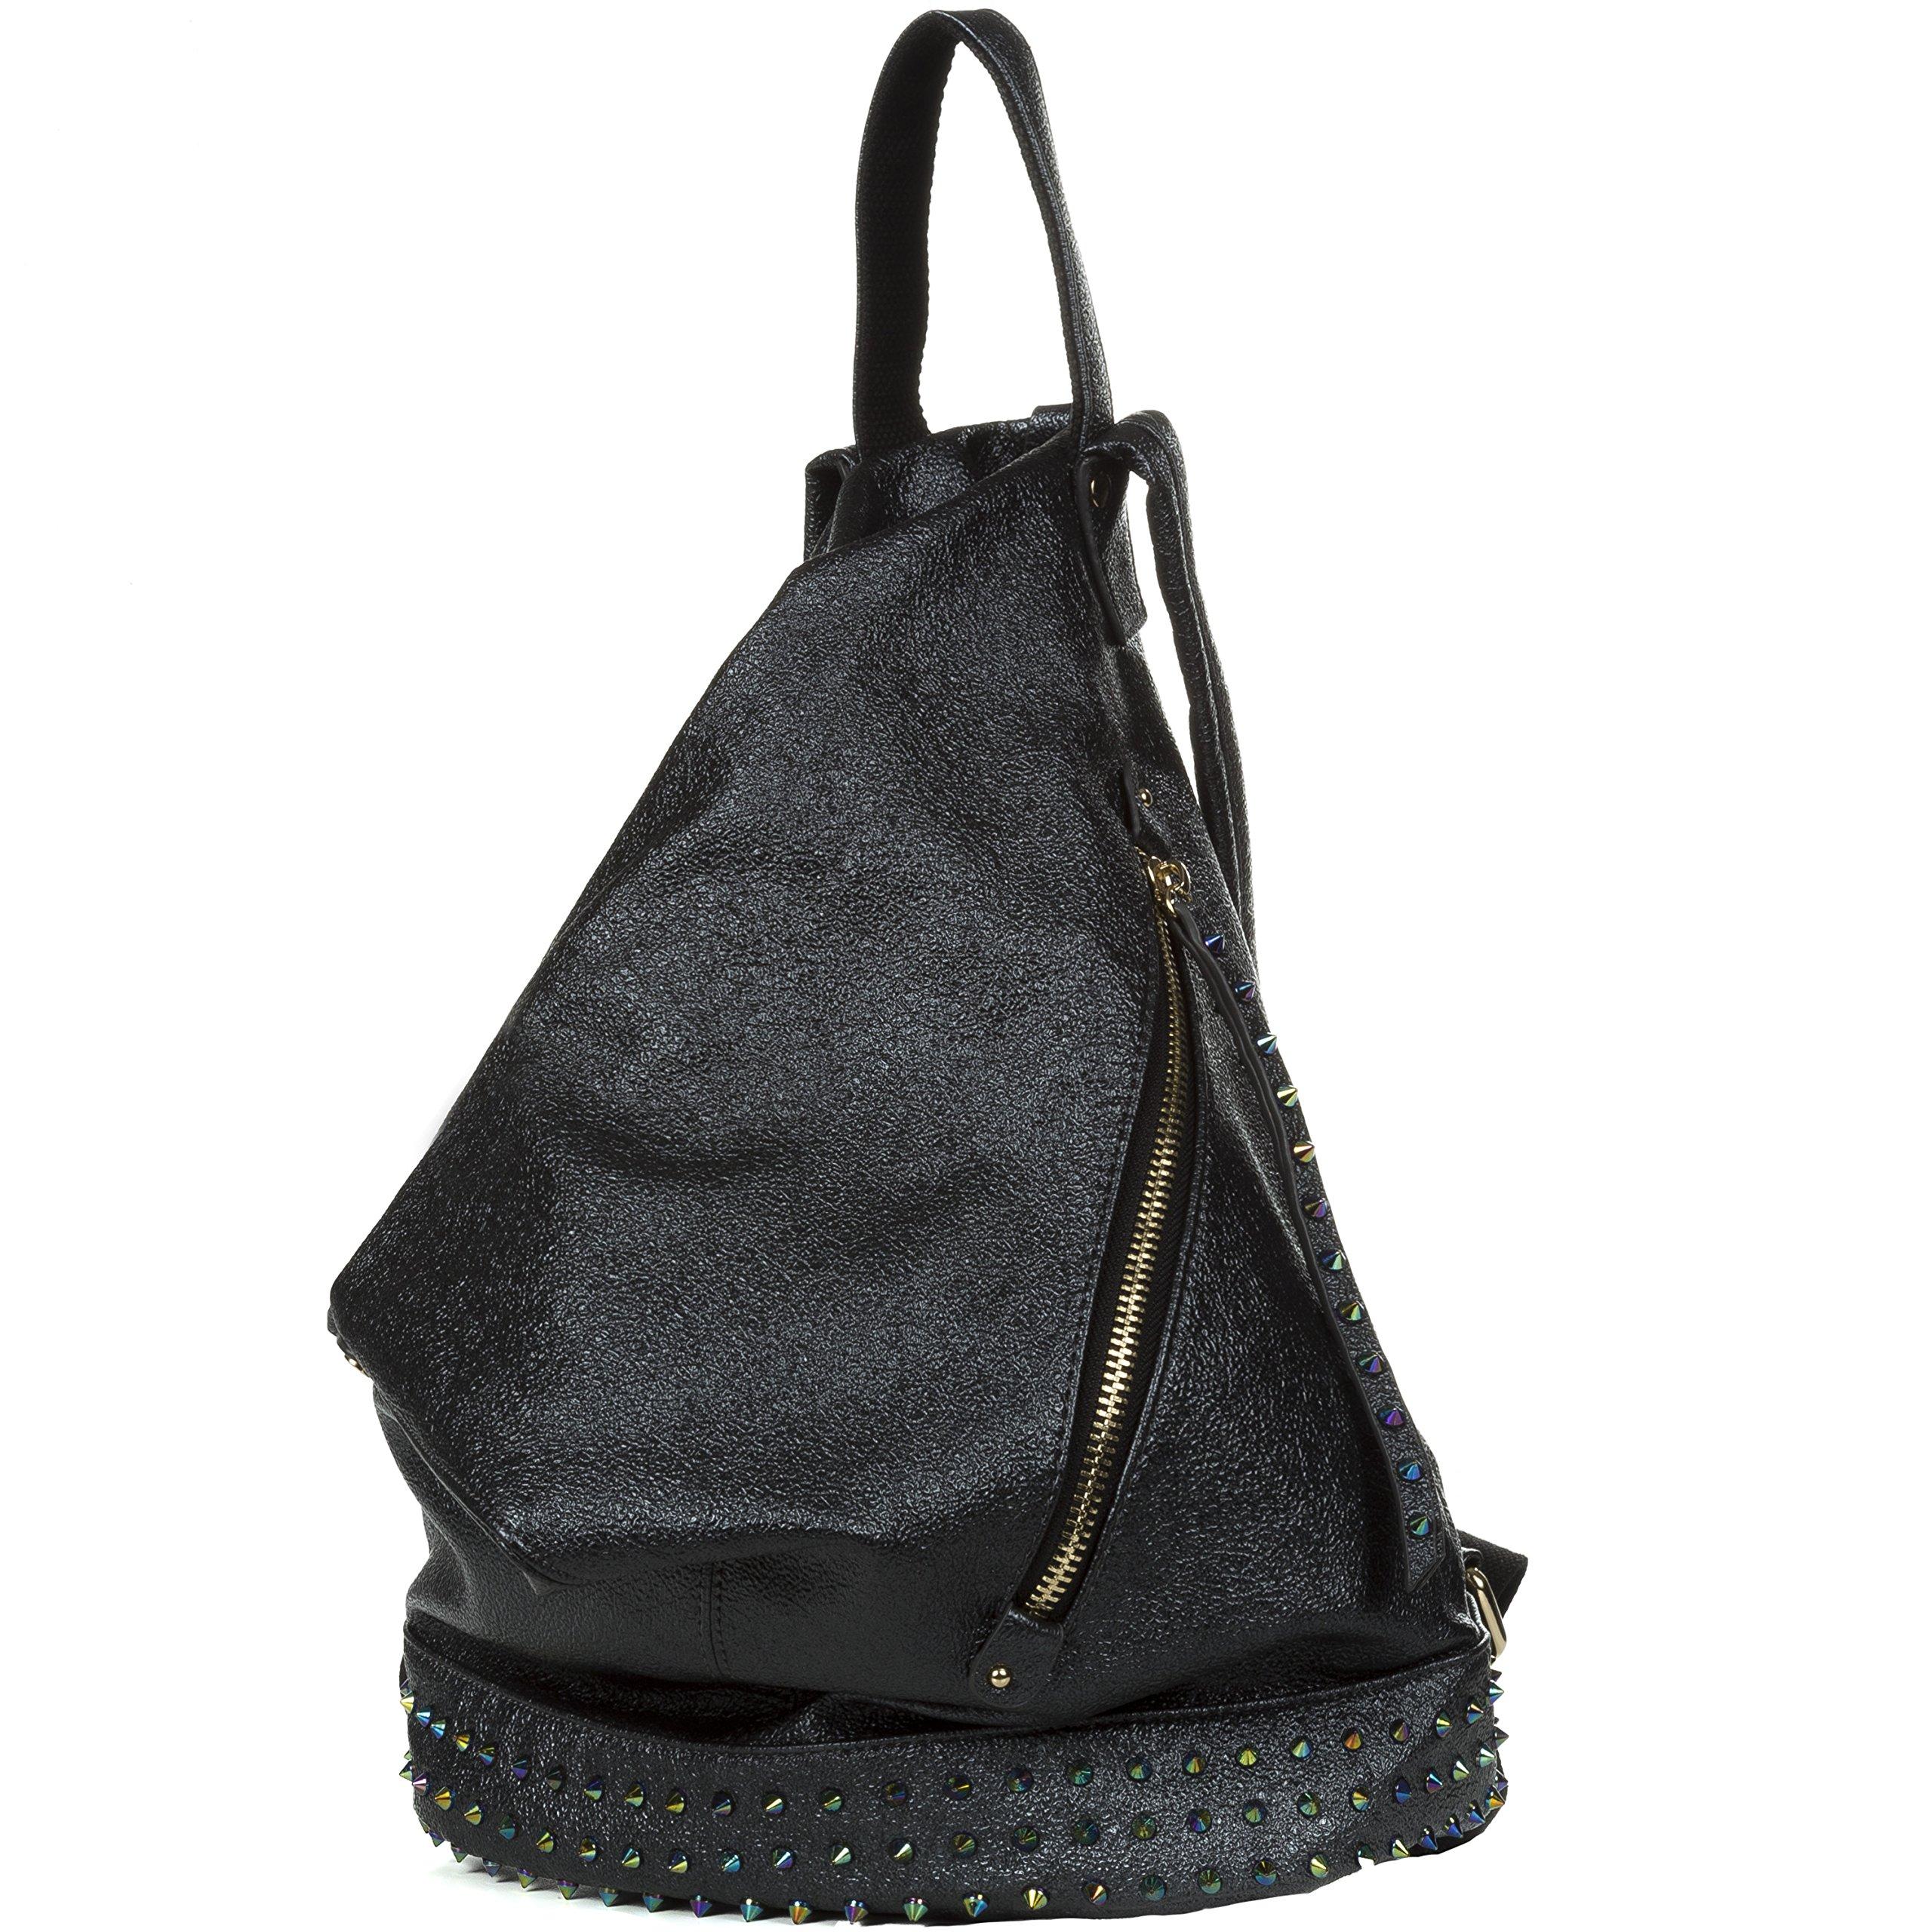 Handbag Republic Fashion Backpack Vegan Leather Travel Bag Easy Carry For Women by Handbag Republic (Image #2)